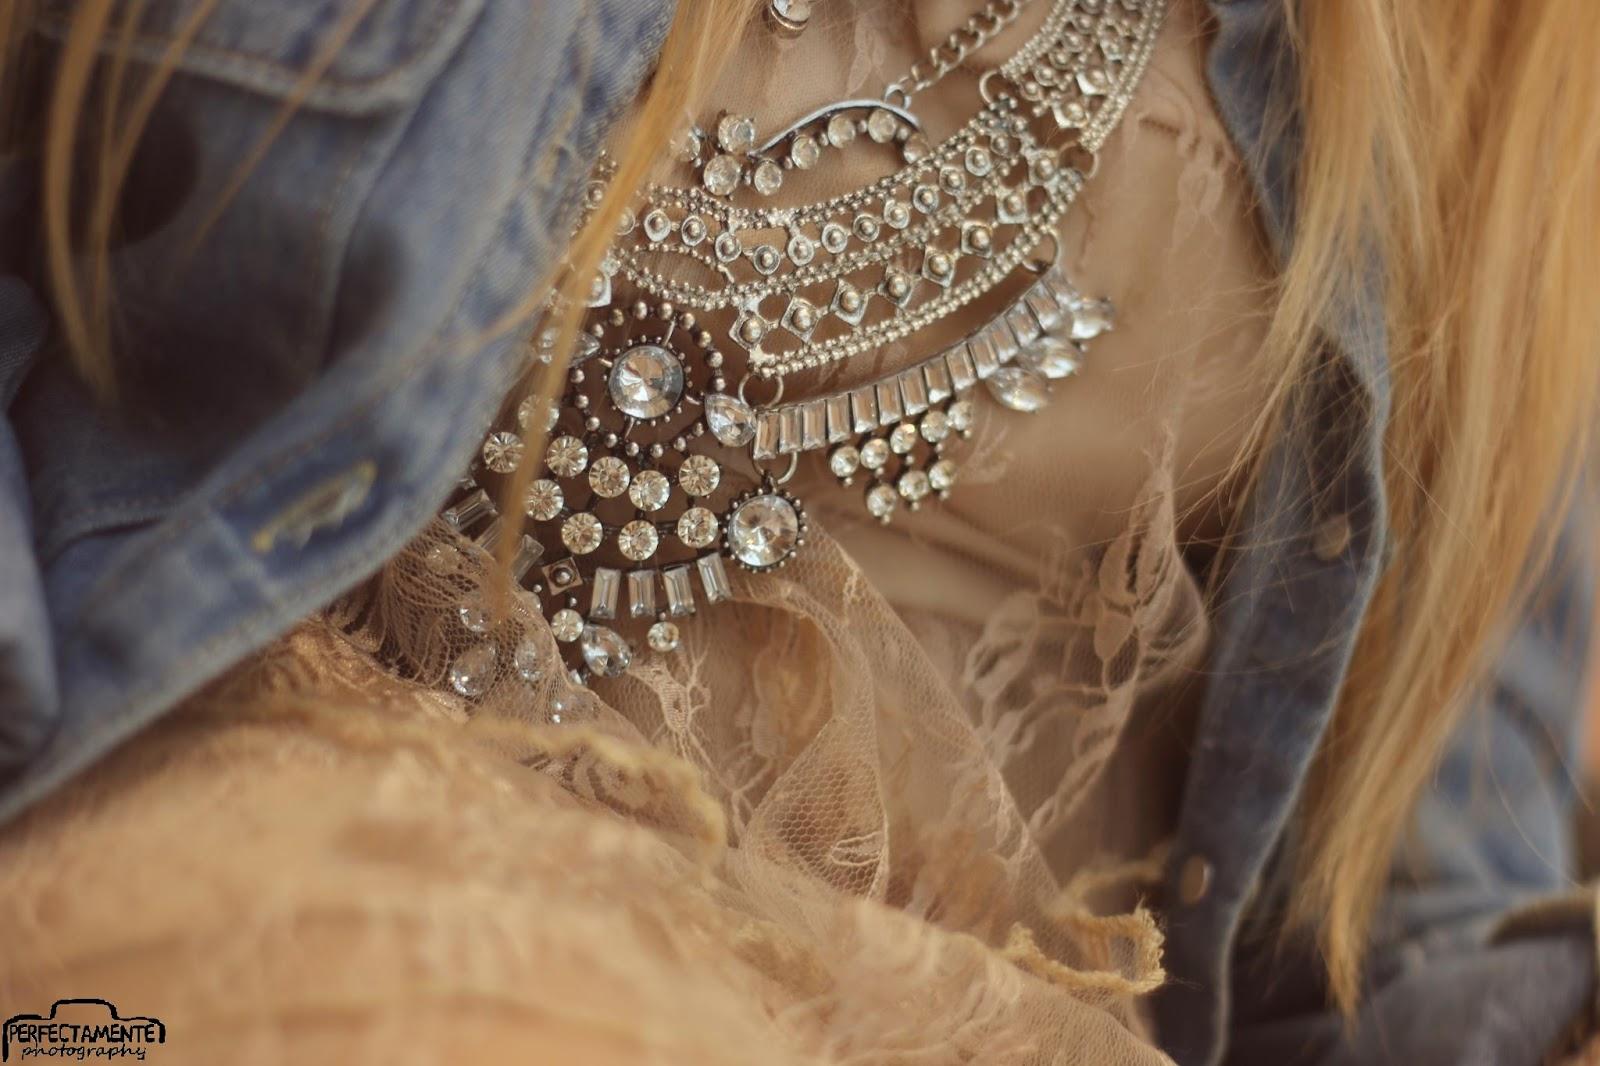 pastelowa koronkowa sukienka na wesele